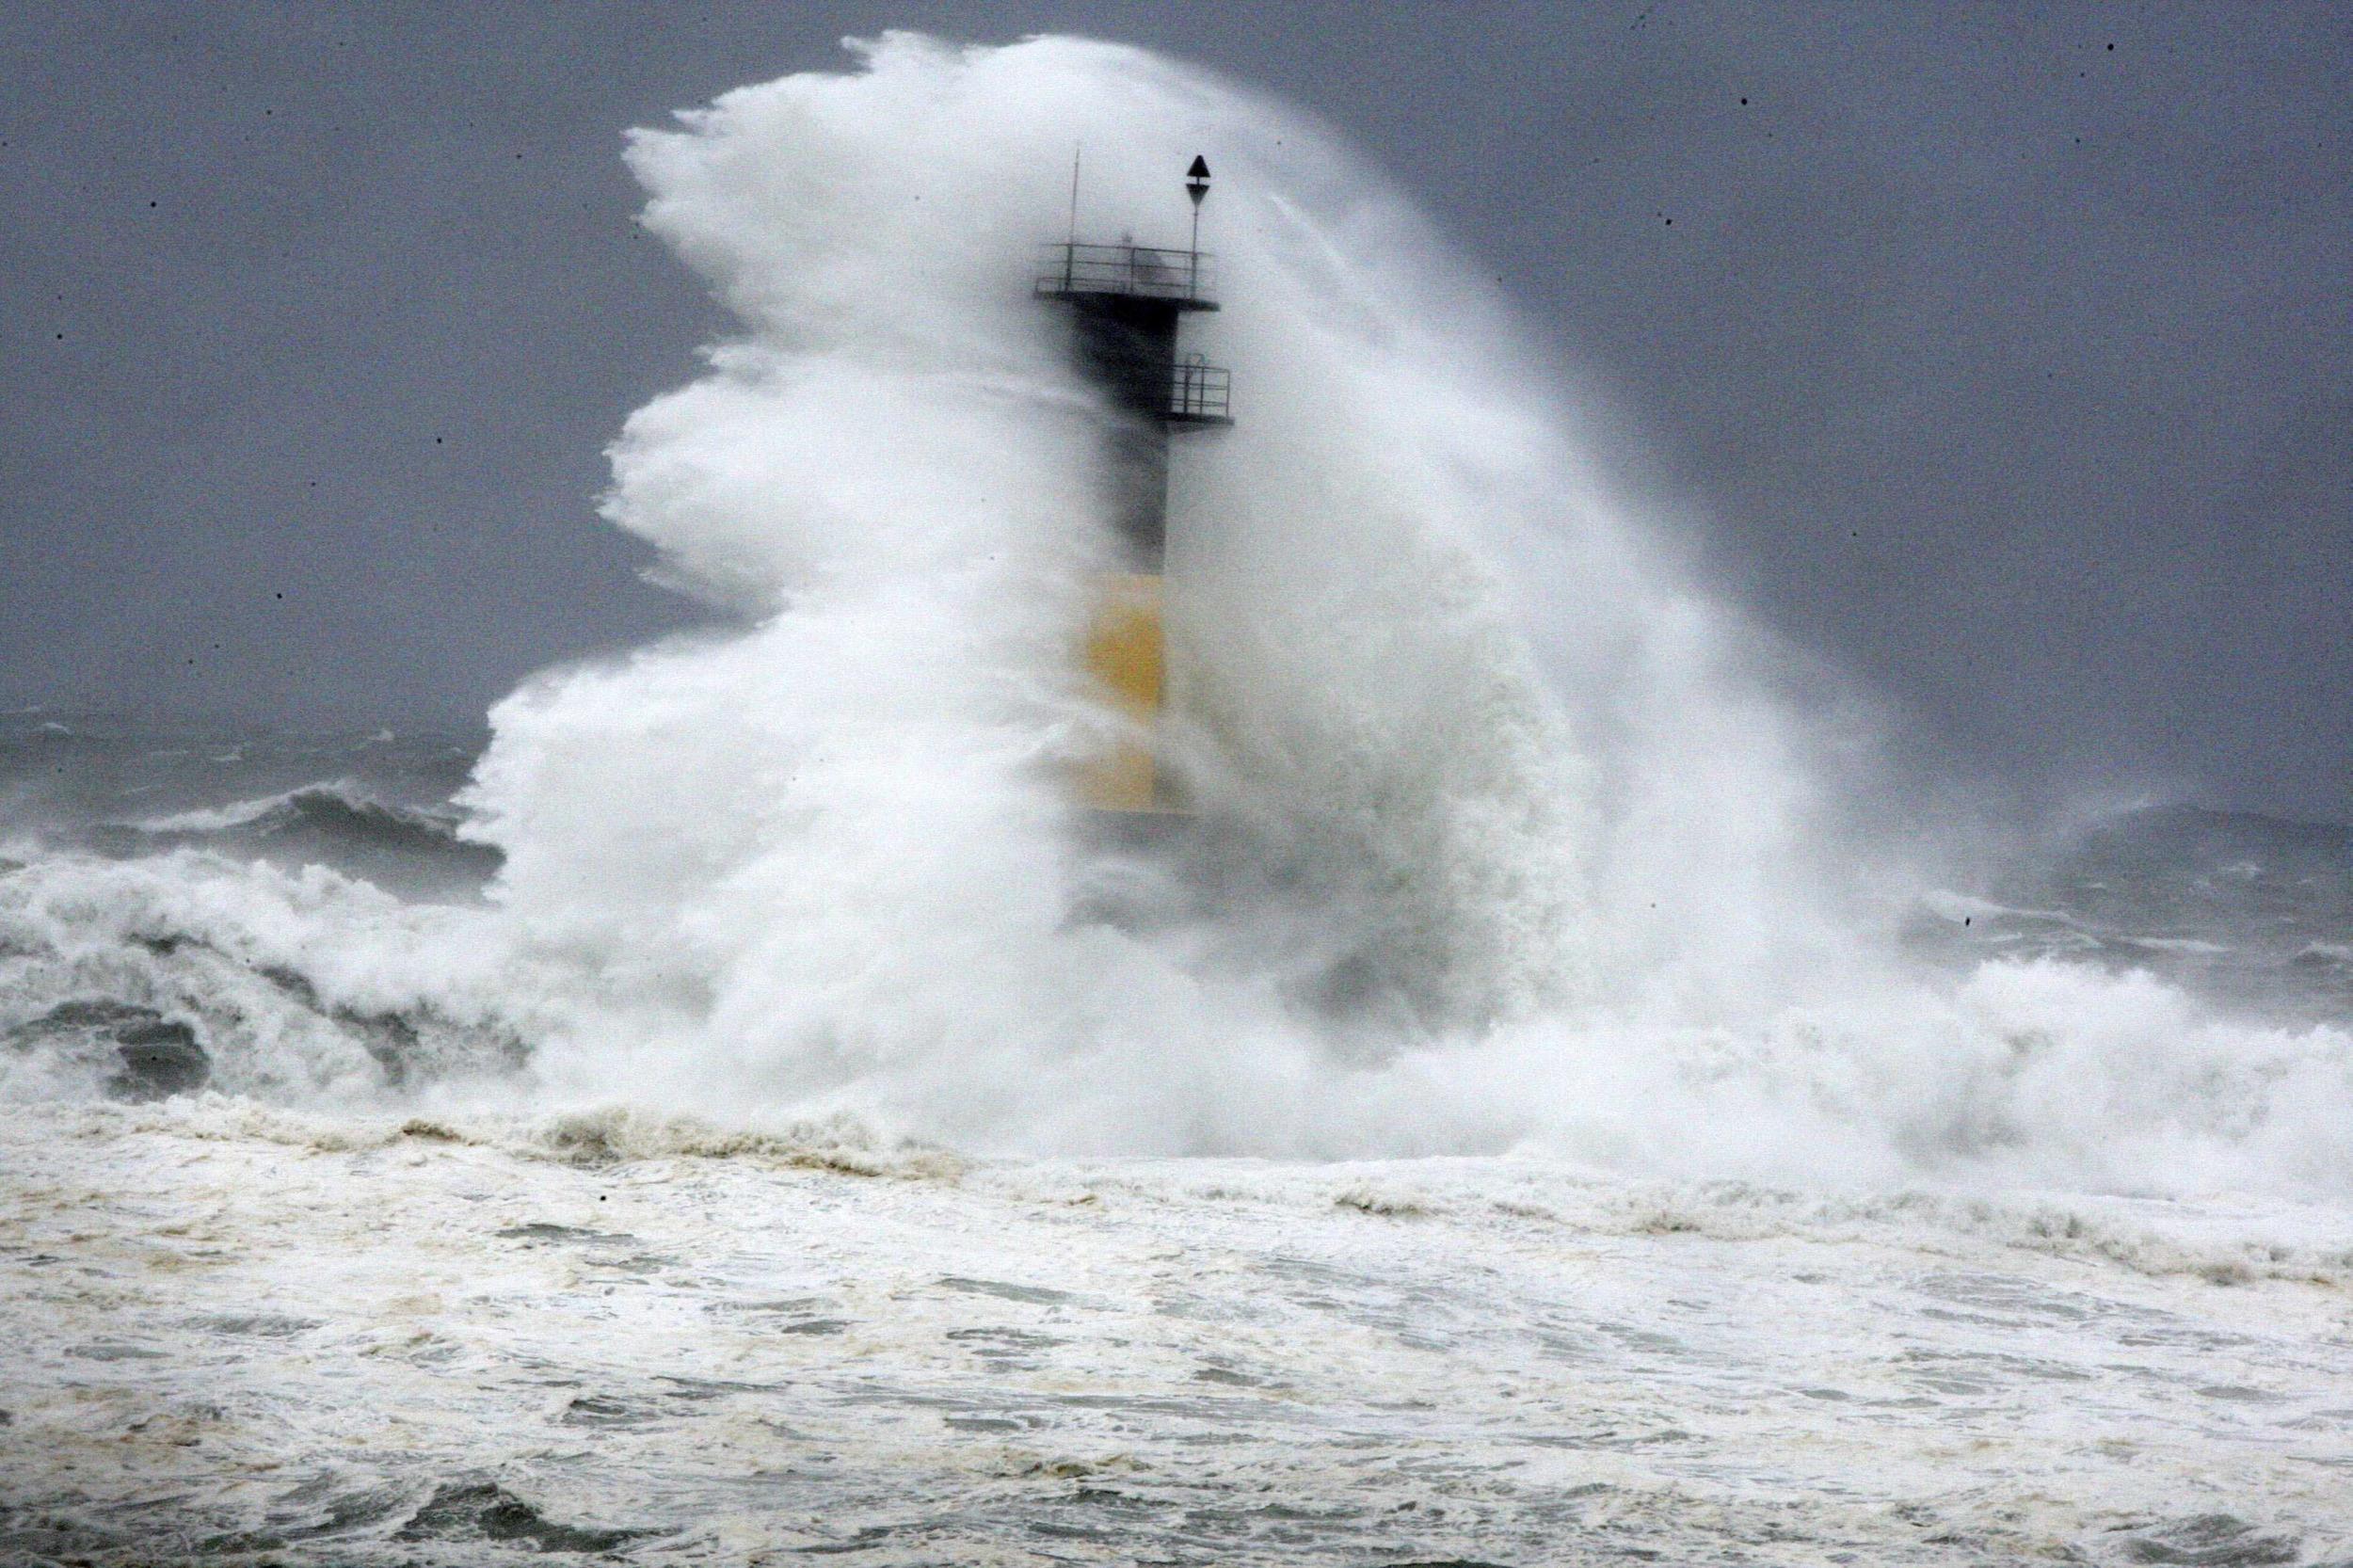 Image: Waves hit lighthouse on Japan's Jeju Island